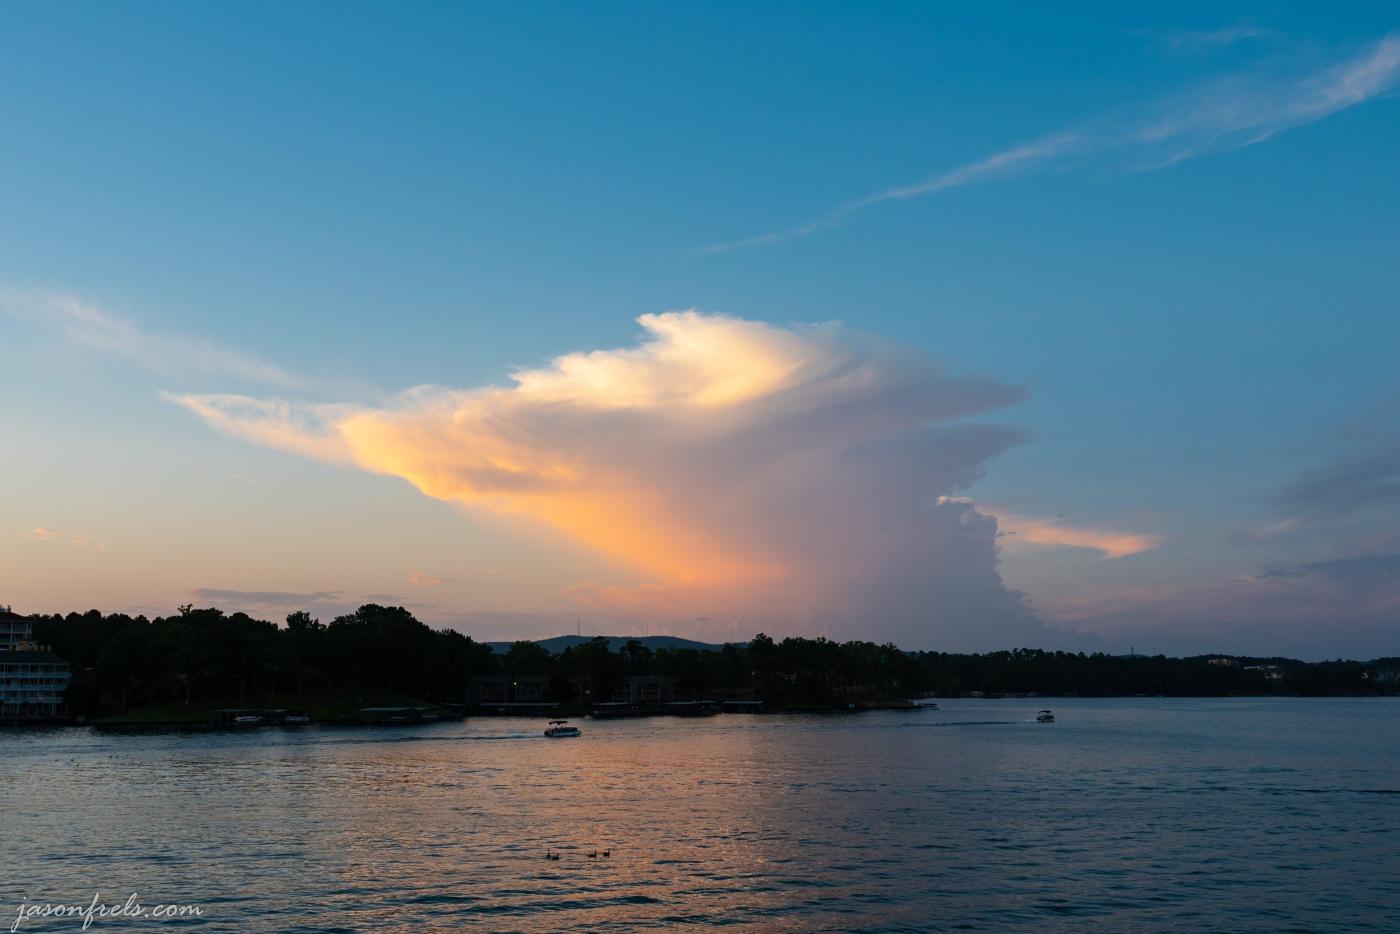 Sunset clouds over Lake Hamilton in Hot Springs Arkansas